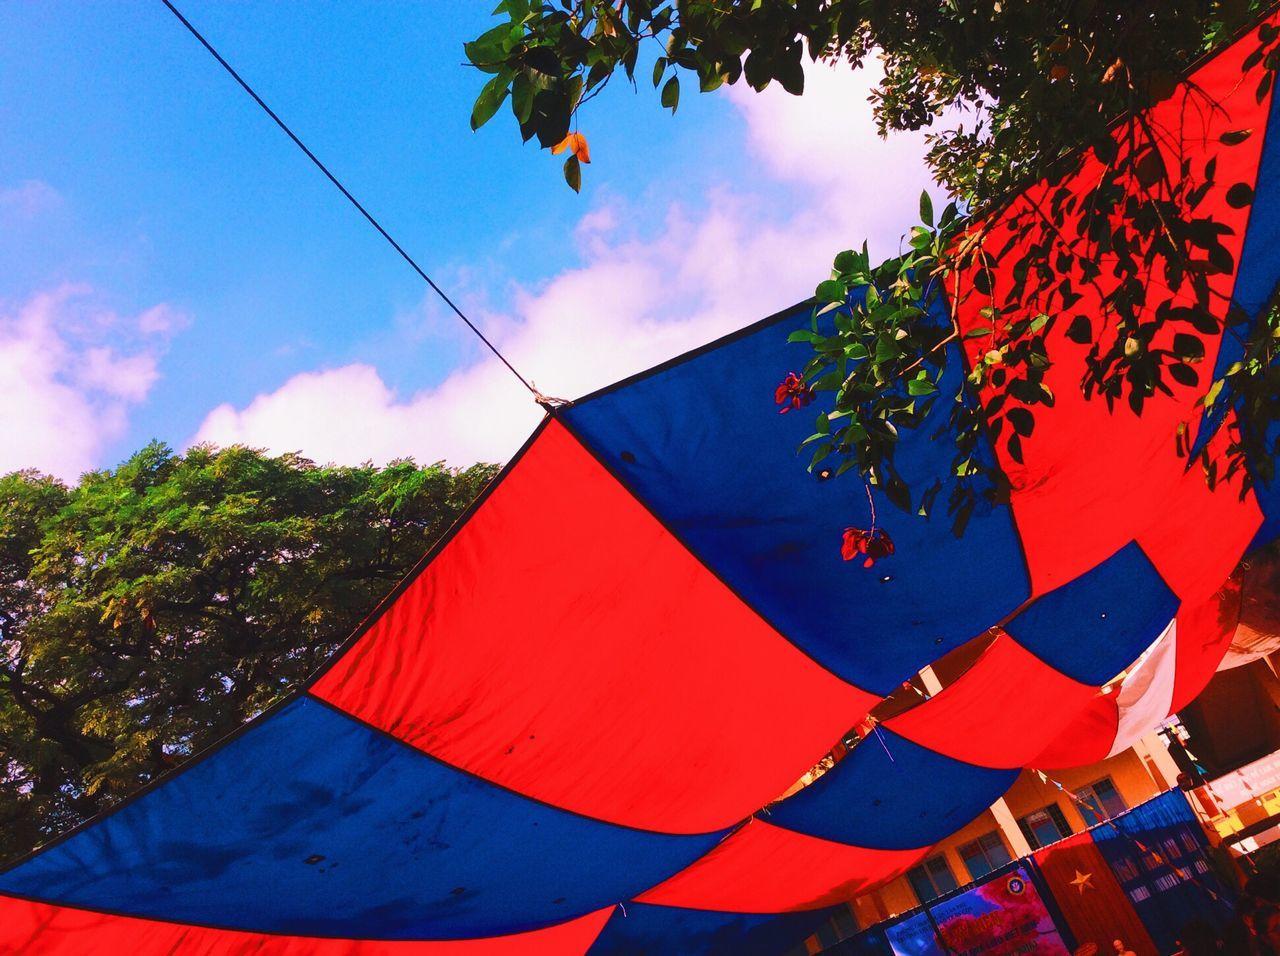 School Love My School MySchool Loveschool Life Story Market Vietnam Vietnamese Nopeople ^ ! Style Photography Like Follow The Sky Thesky ldpic #miss hi #hello #eyeem #instagram #vsco #vscocam #lone #blue #red #too #so #class #free #freedom]